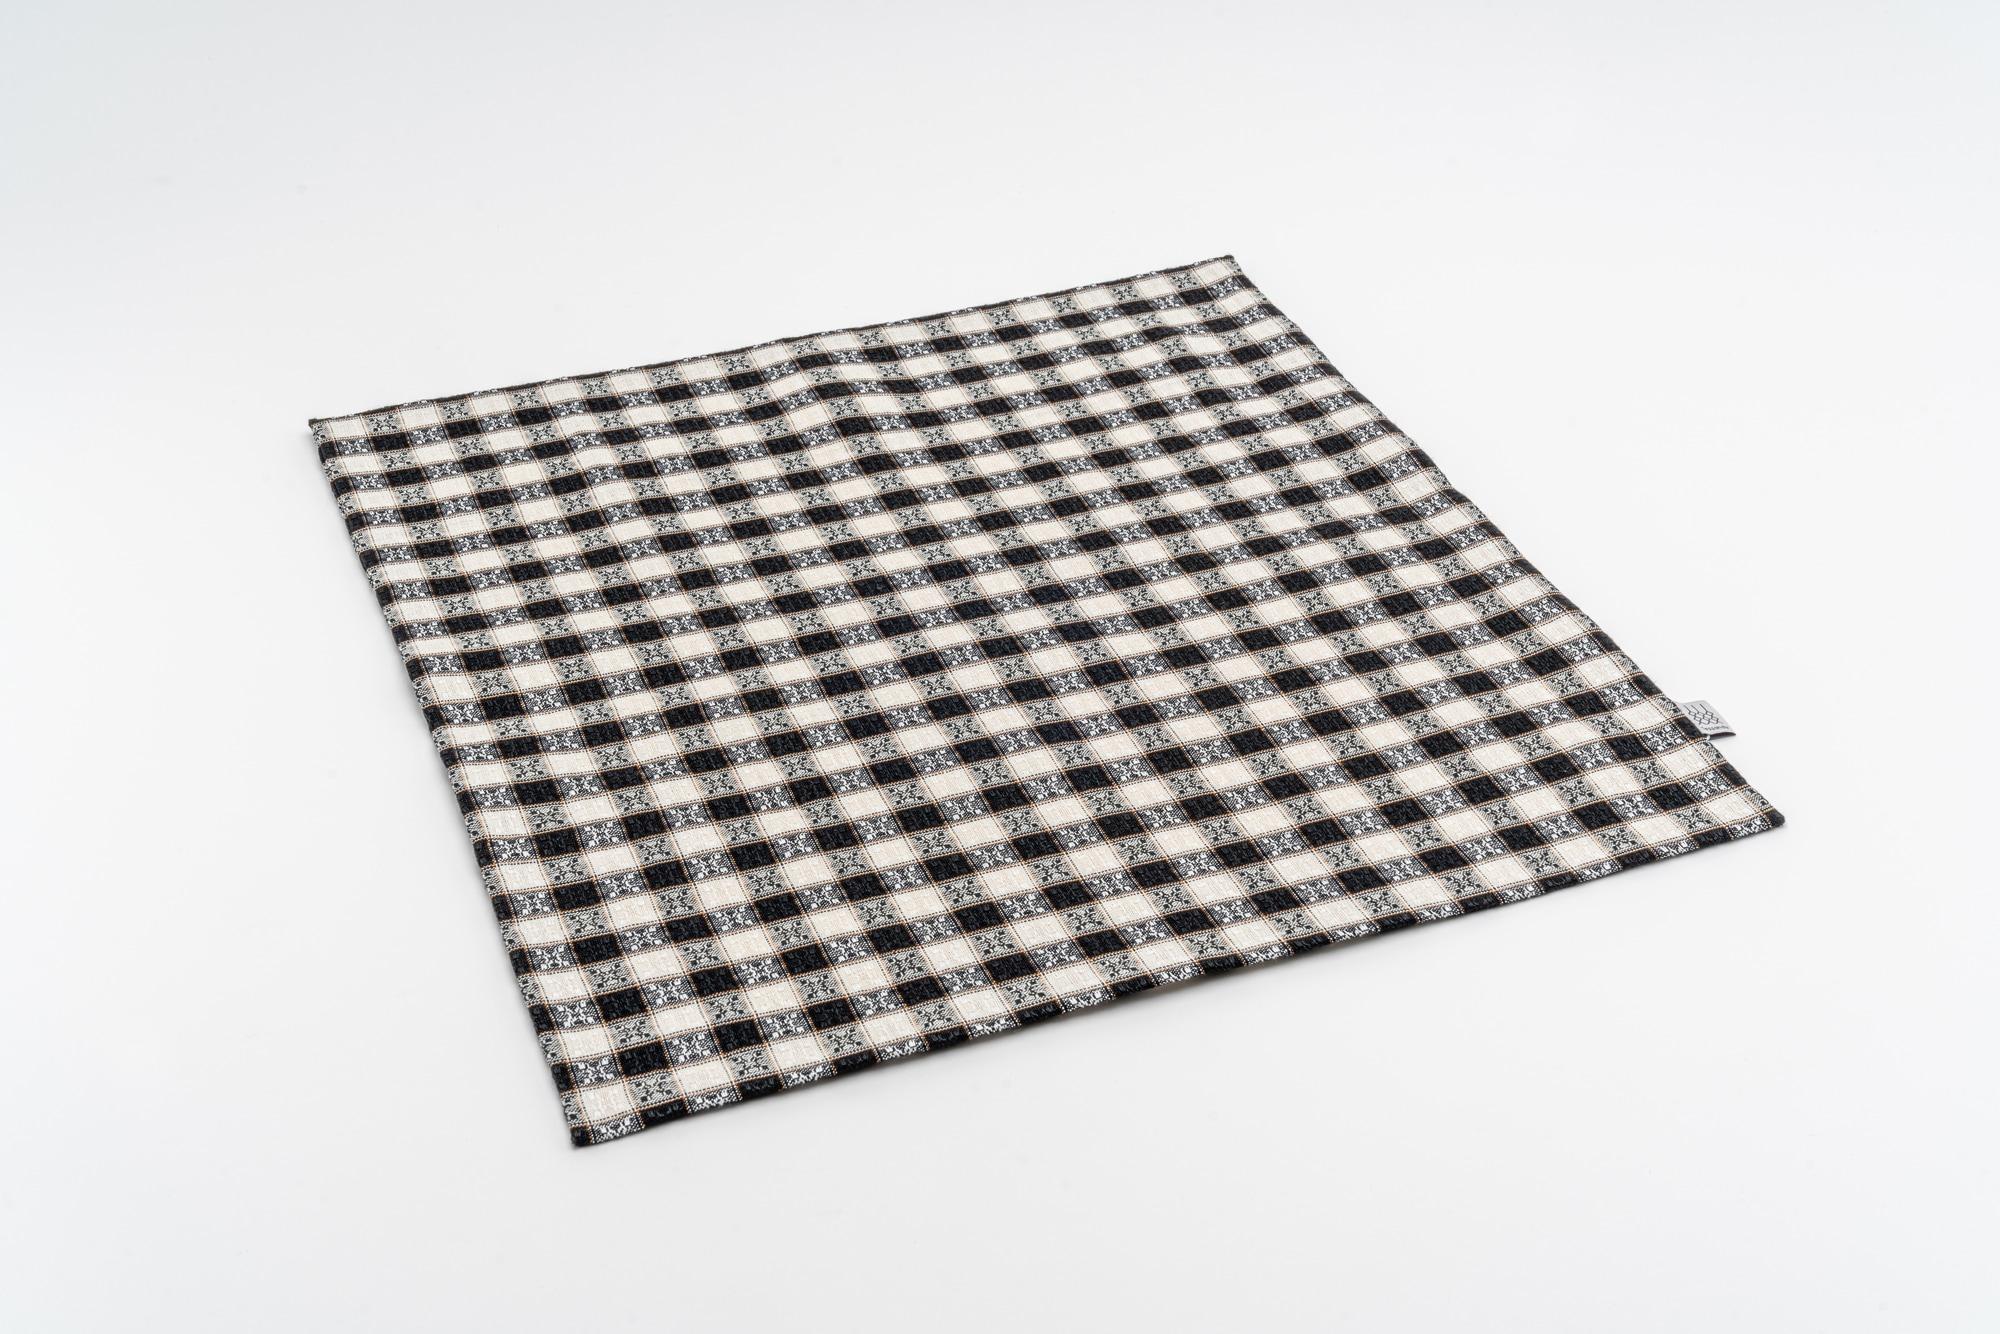 Koelsch Kissenbezug 50×50 Schwarz Weiss offen